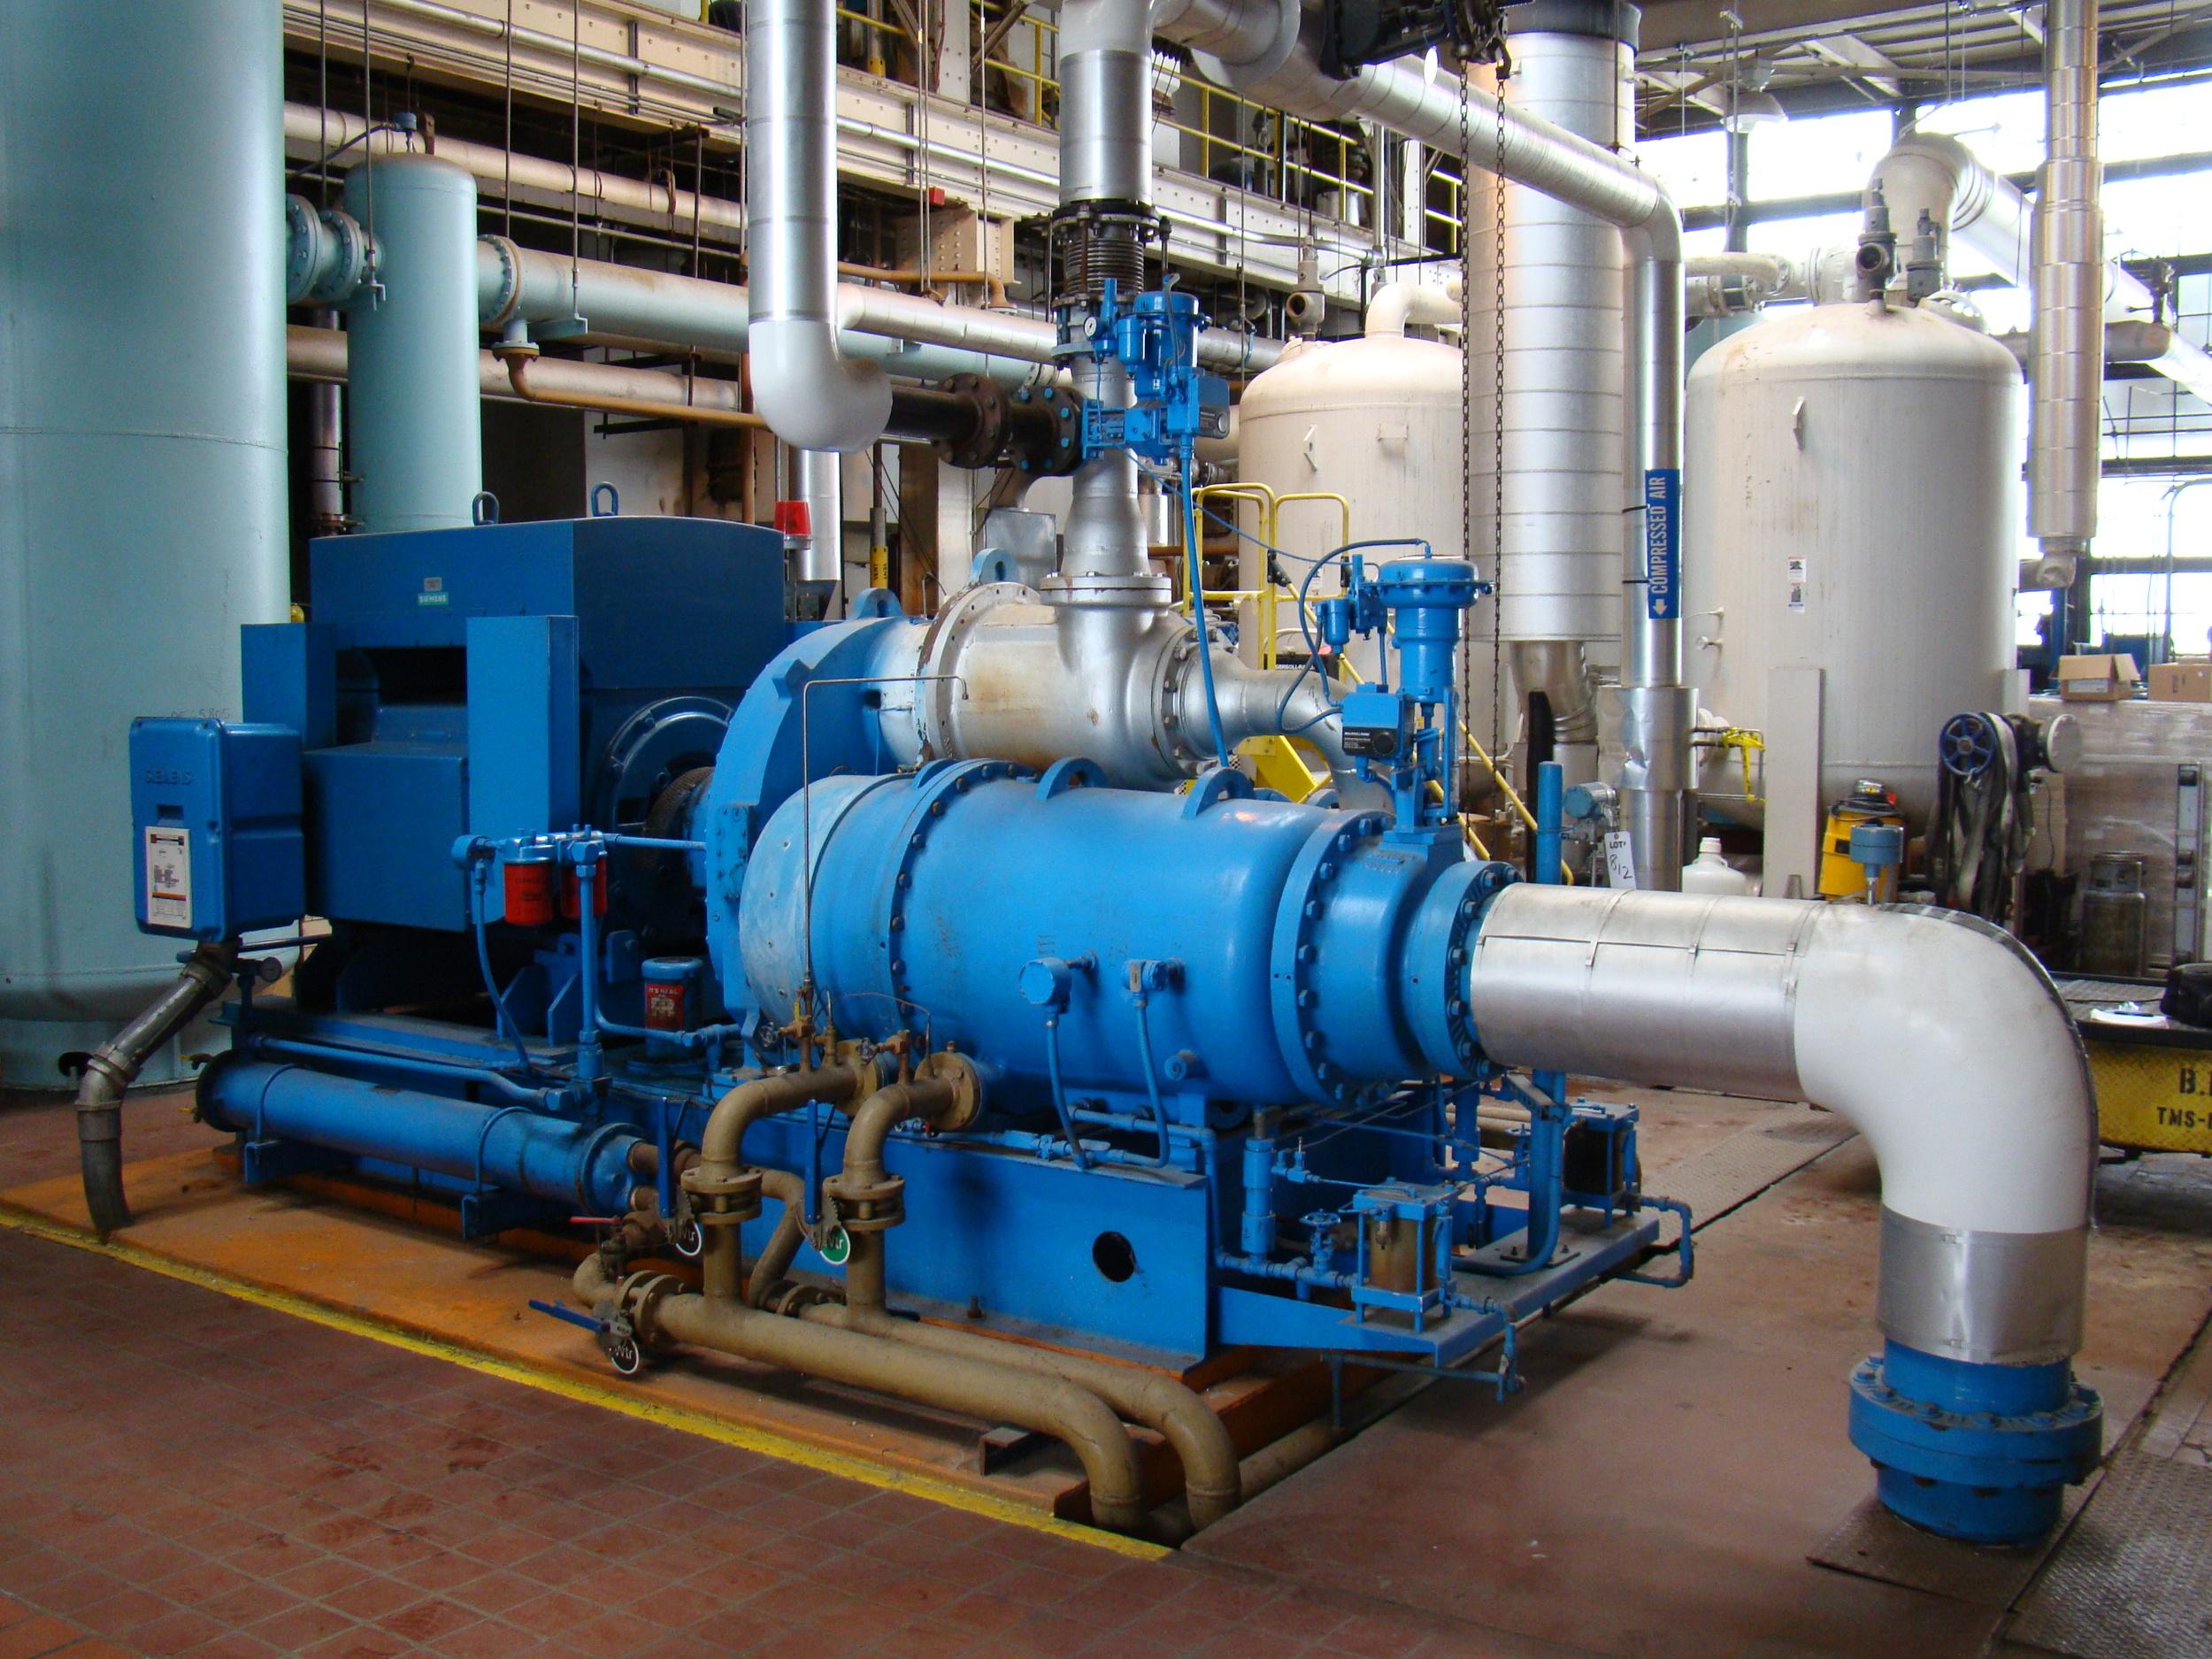 Ingersol Rand Centrifugal Air compressor (5).JPG